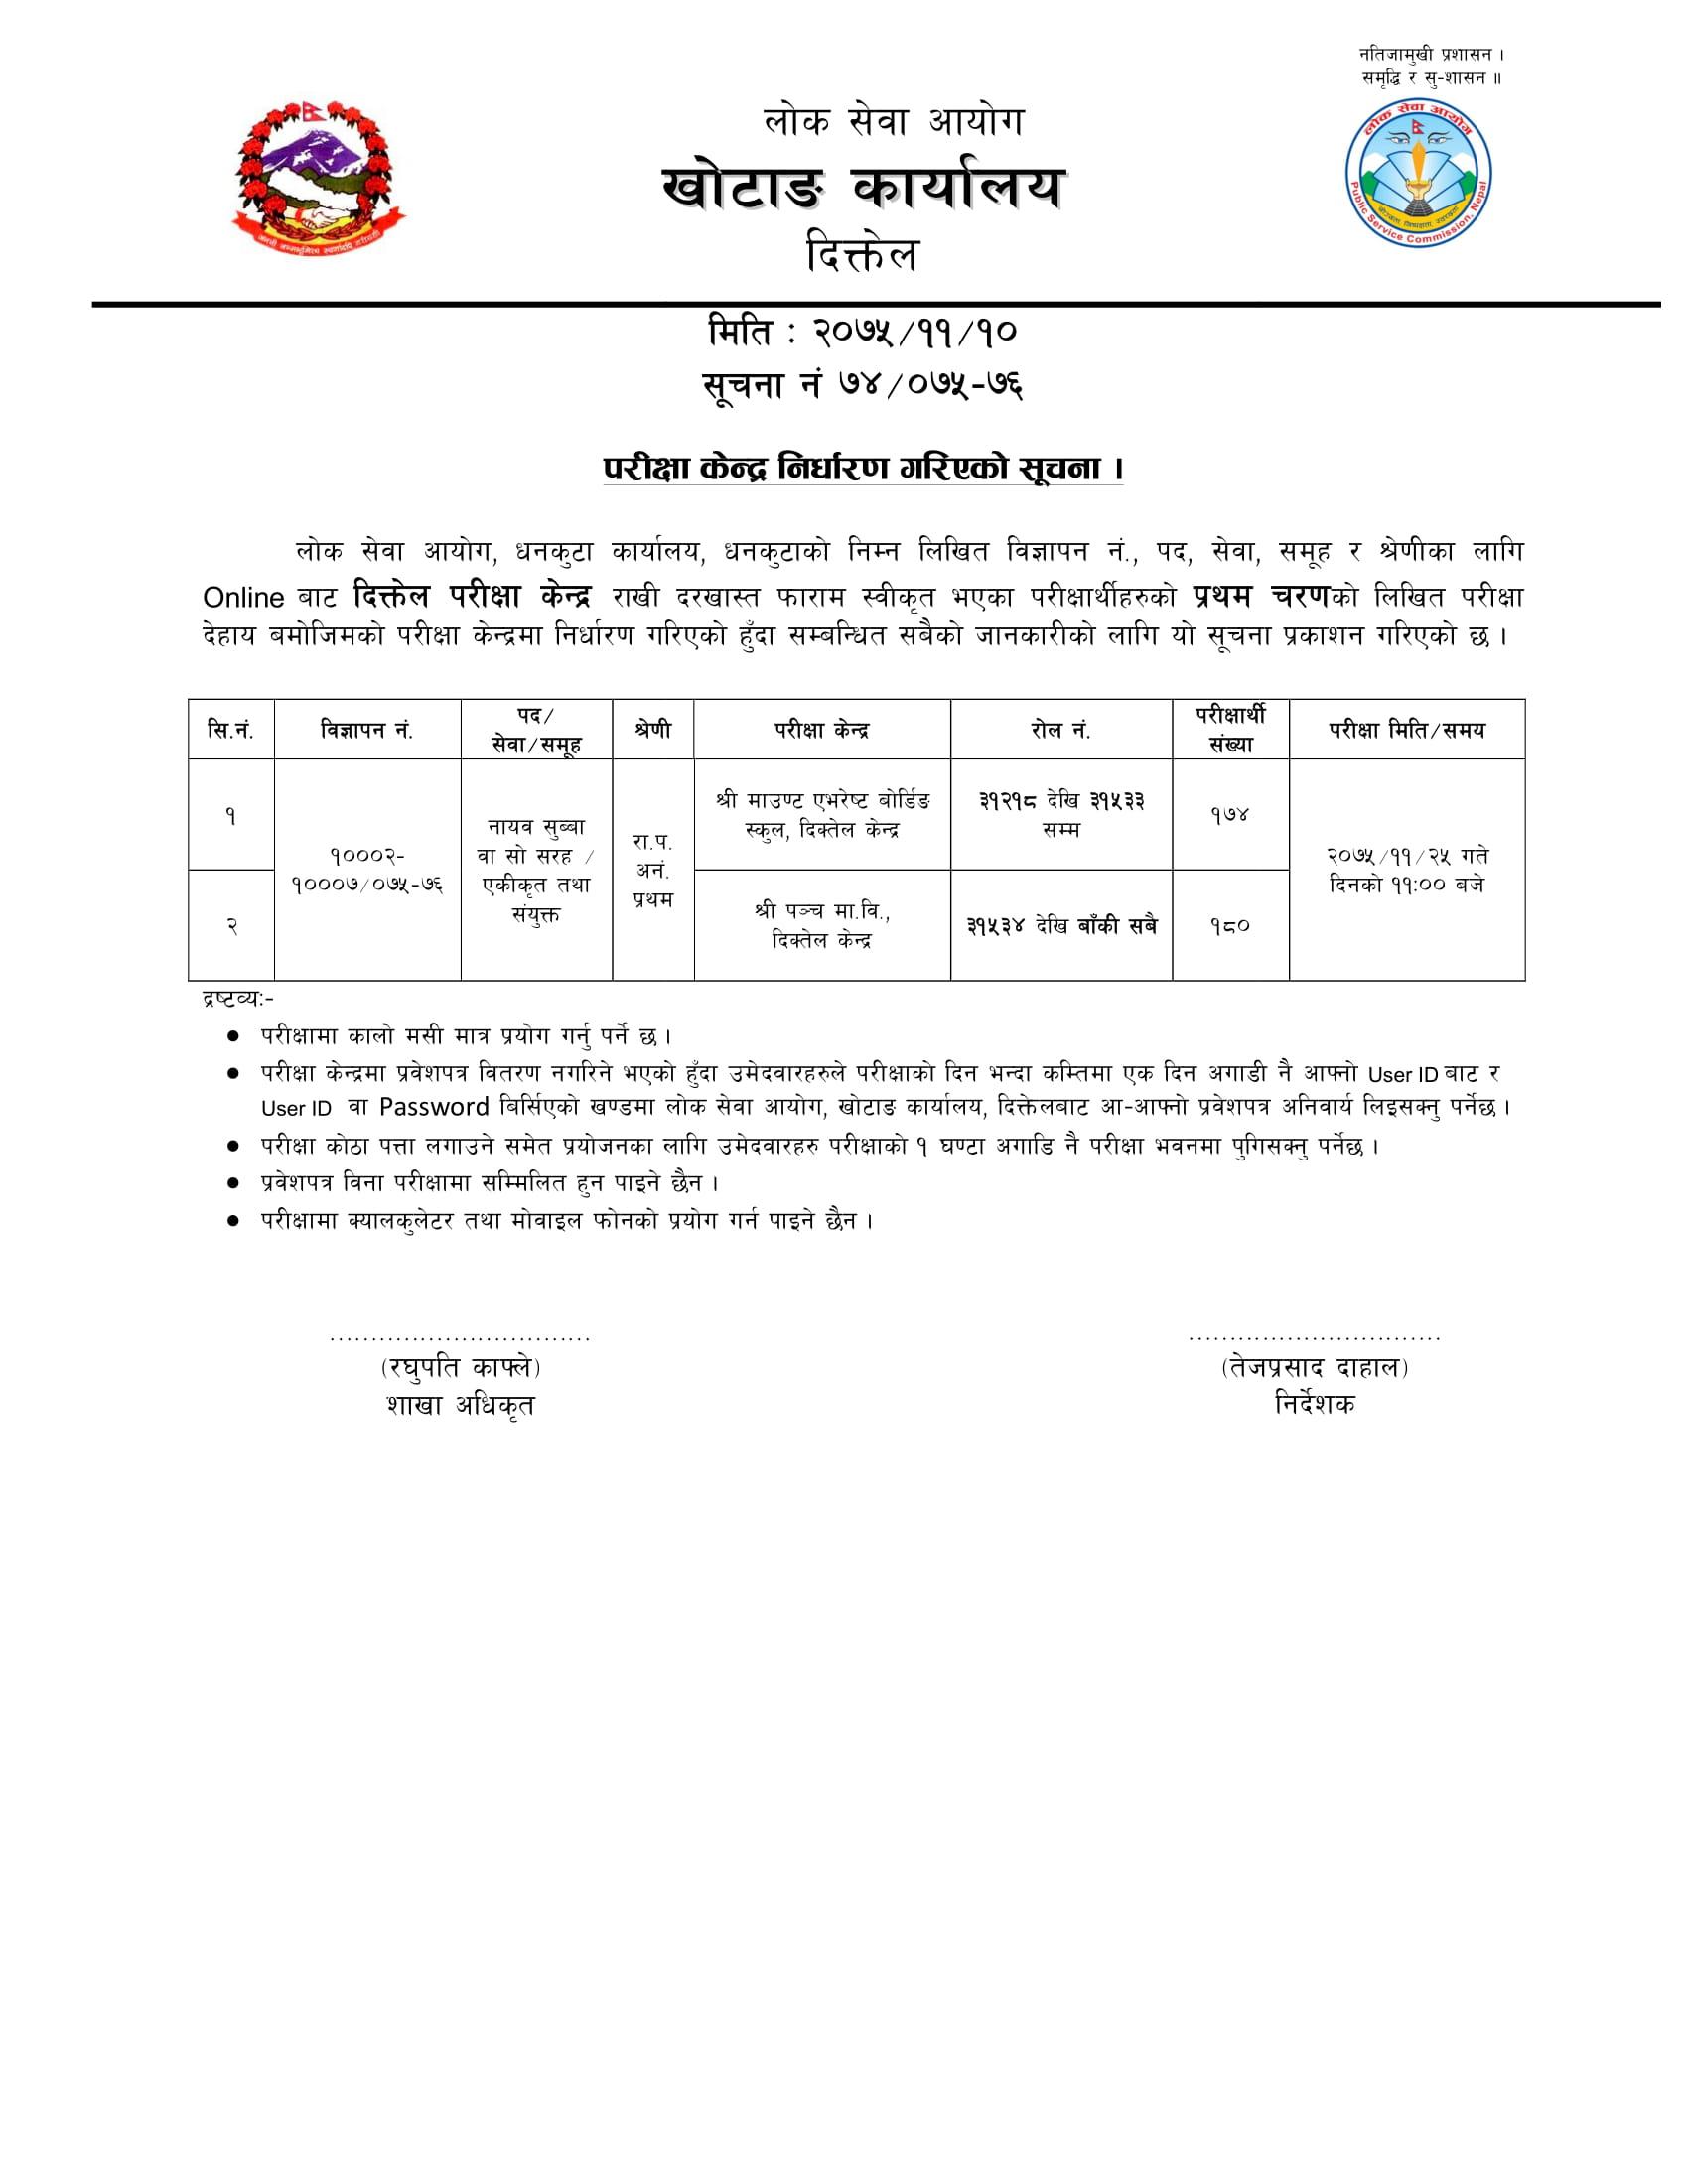 nasu exam center,  nasu exam center diktel,  nasu exam center Dipayal,  nasu exam center dhankuta,  nasu exam center Pokhara,  nasu exam center Kathmandu,  nasu exam center parsa,  nasu exam center 2076,  nasu exam center 2075,  na su exam center, psc.gov. nasu exam center,  psc.gov.np nasu exam center,  psc nasu exam center,  psc exam center